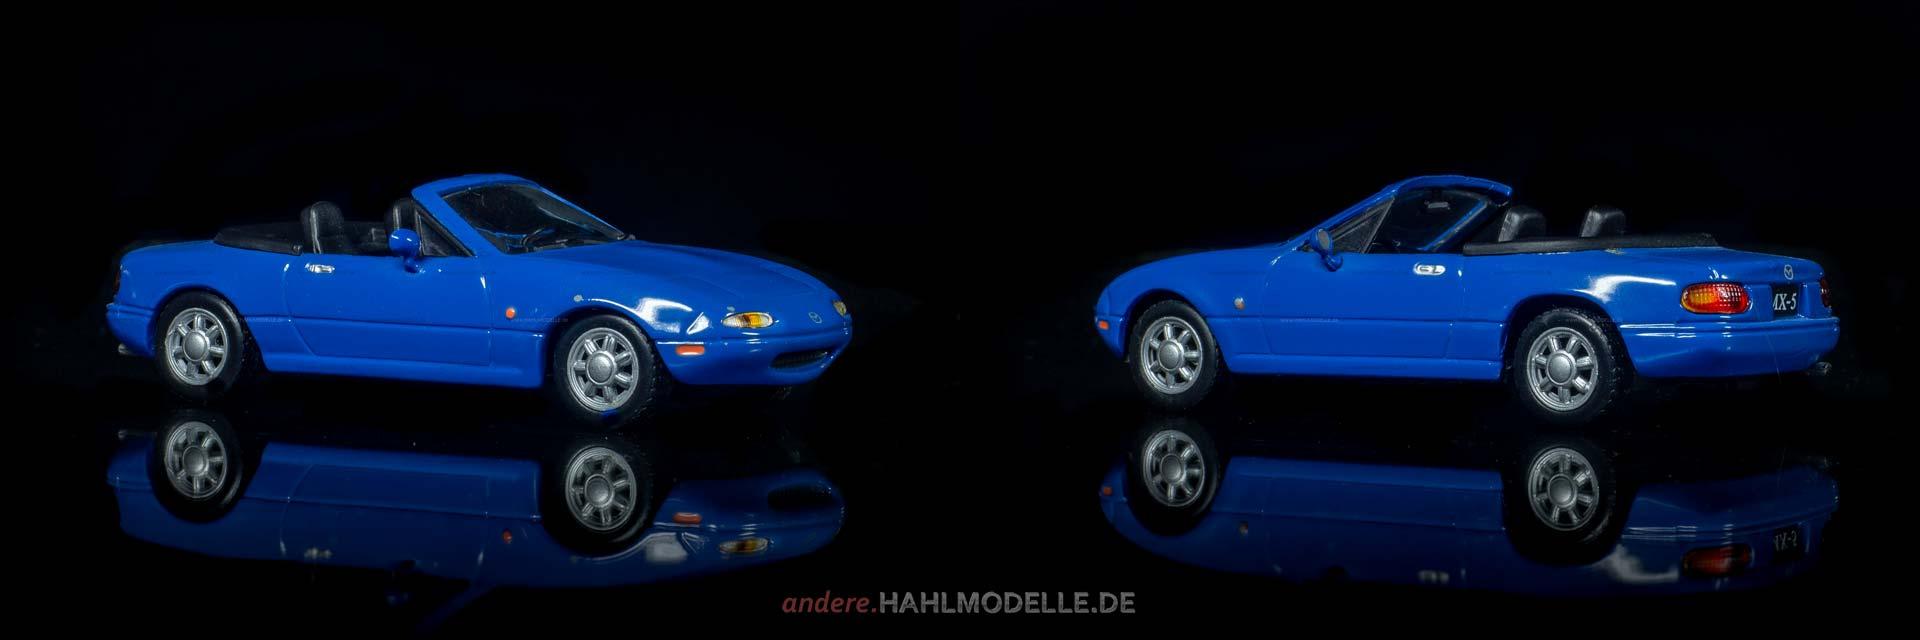 | www.andere.hahlmodelle.de